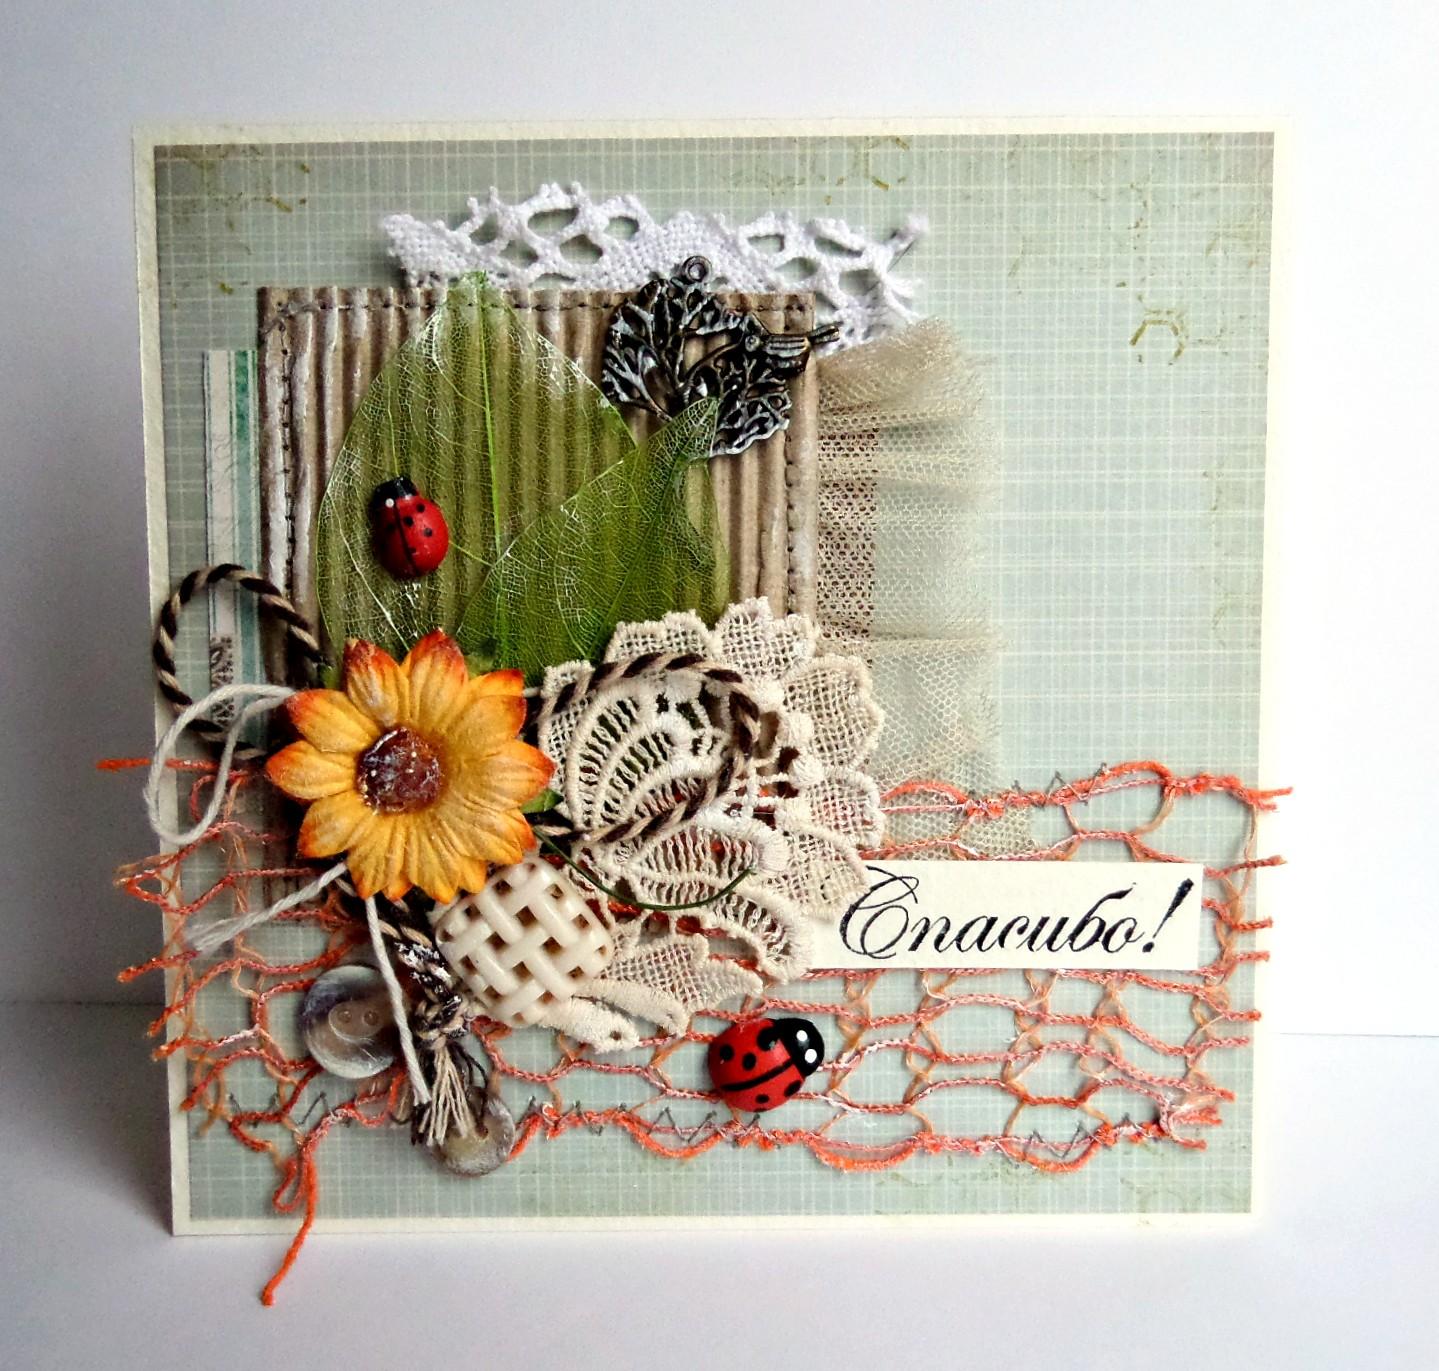 Осенние открытки спасибо 73